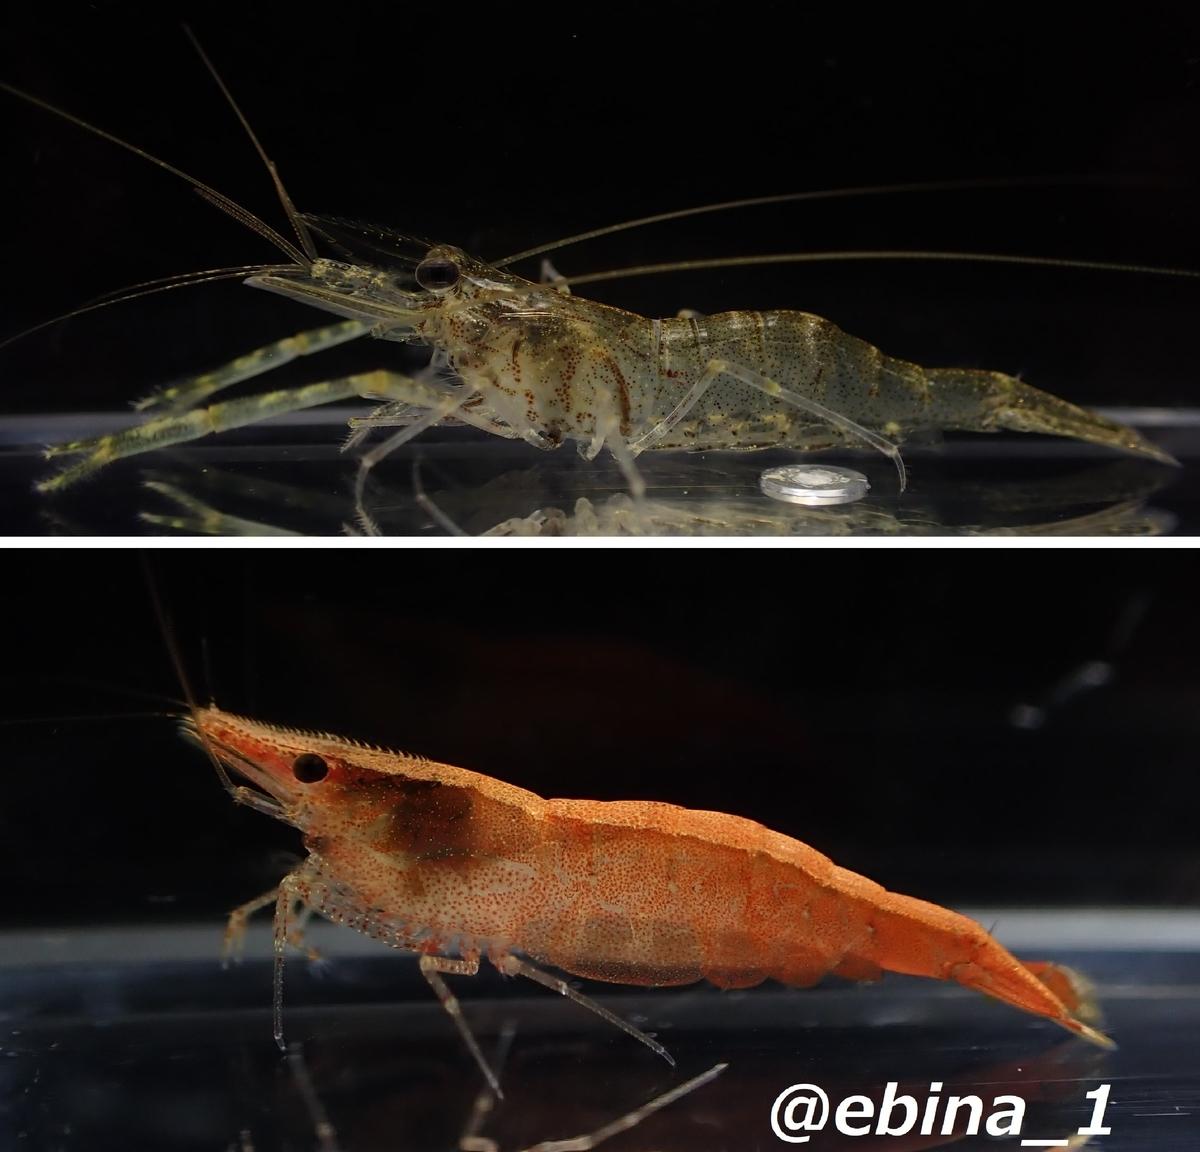 f:id:ebina-1:20210501180855j:plain